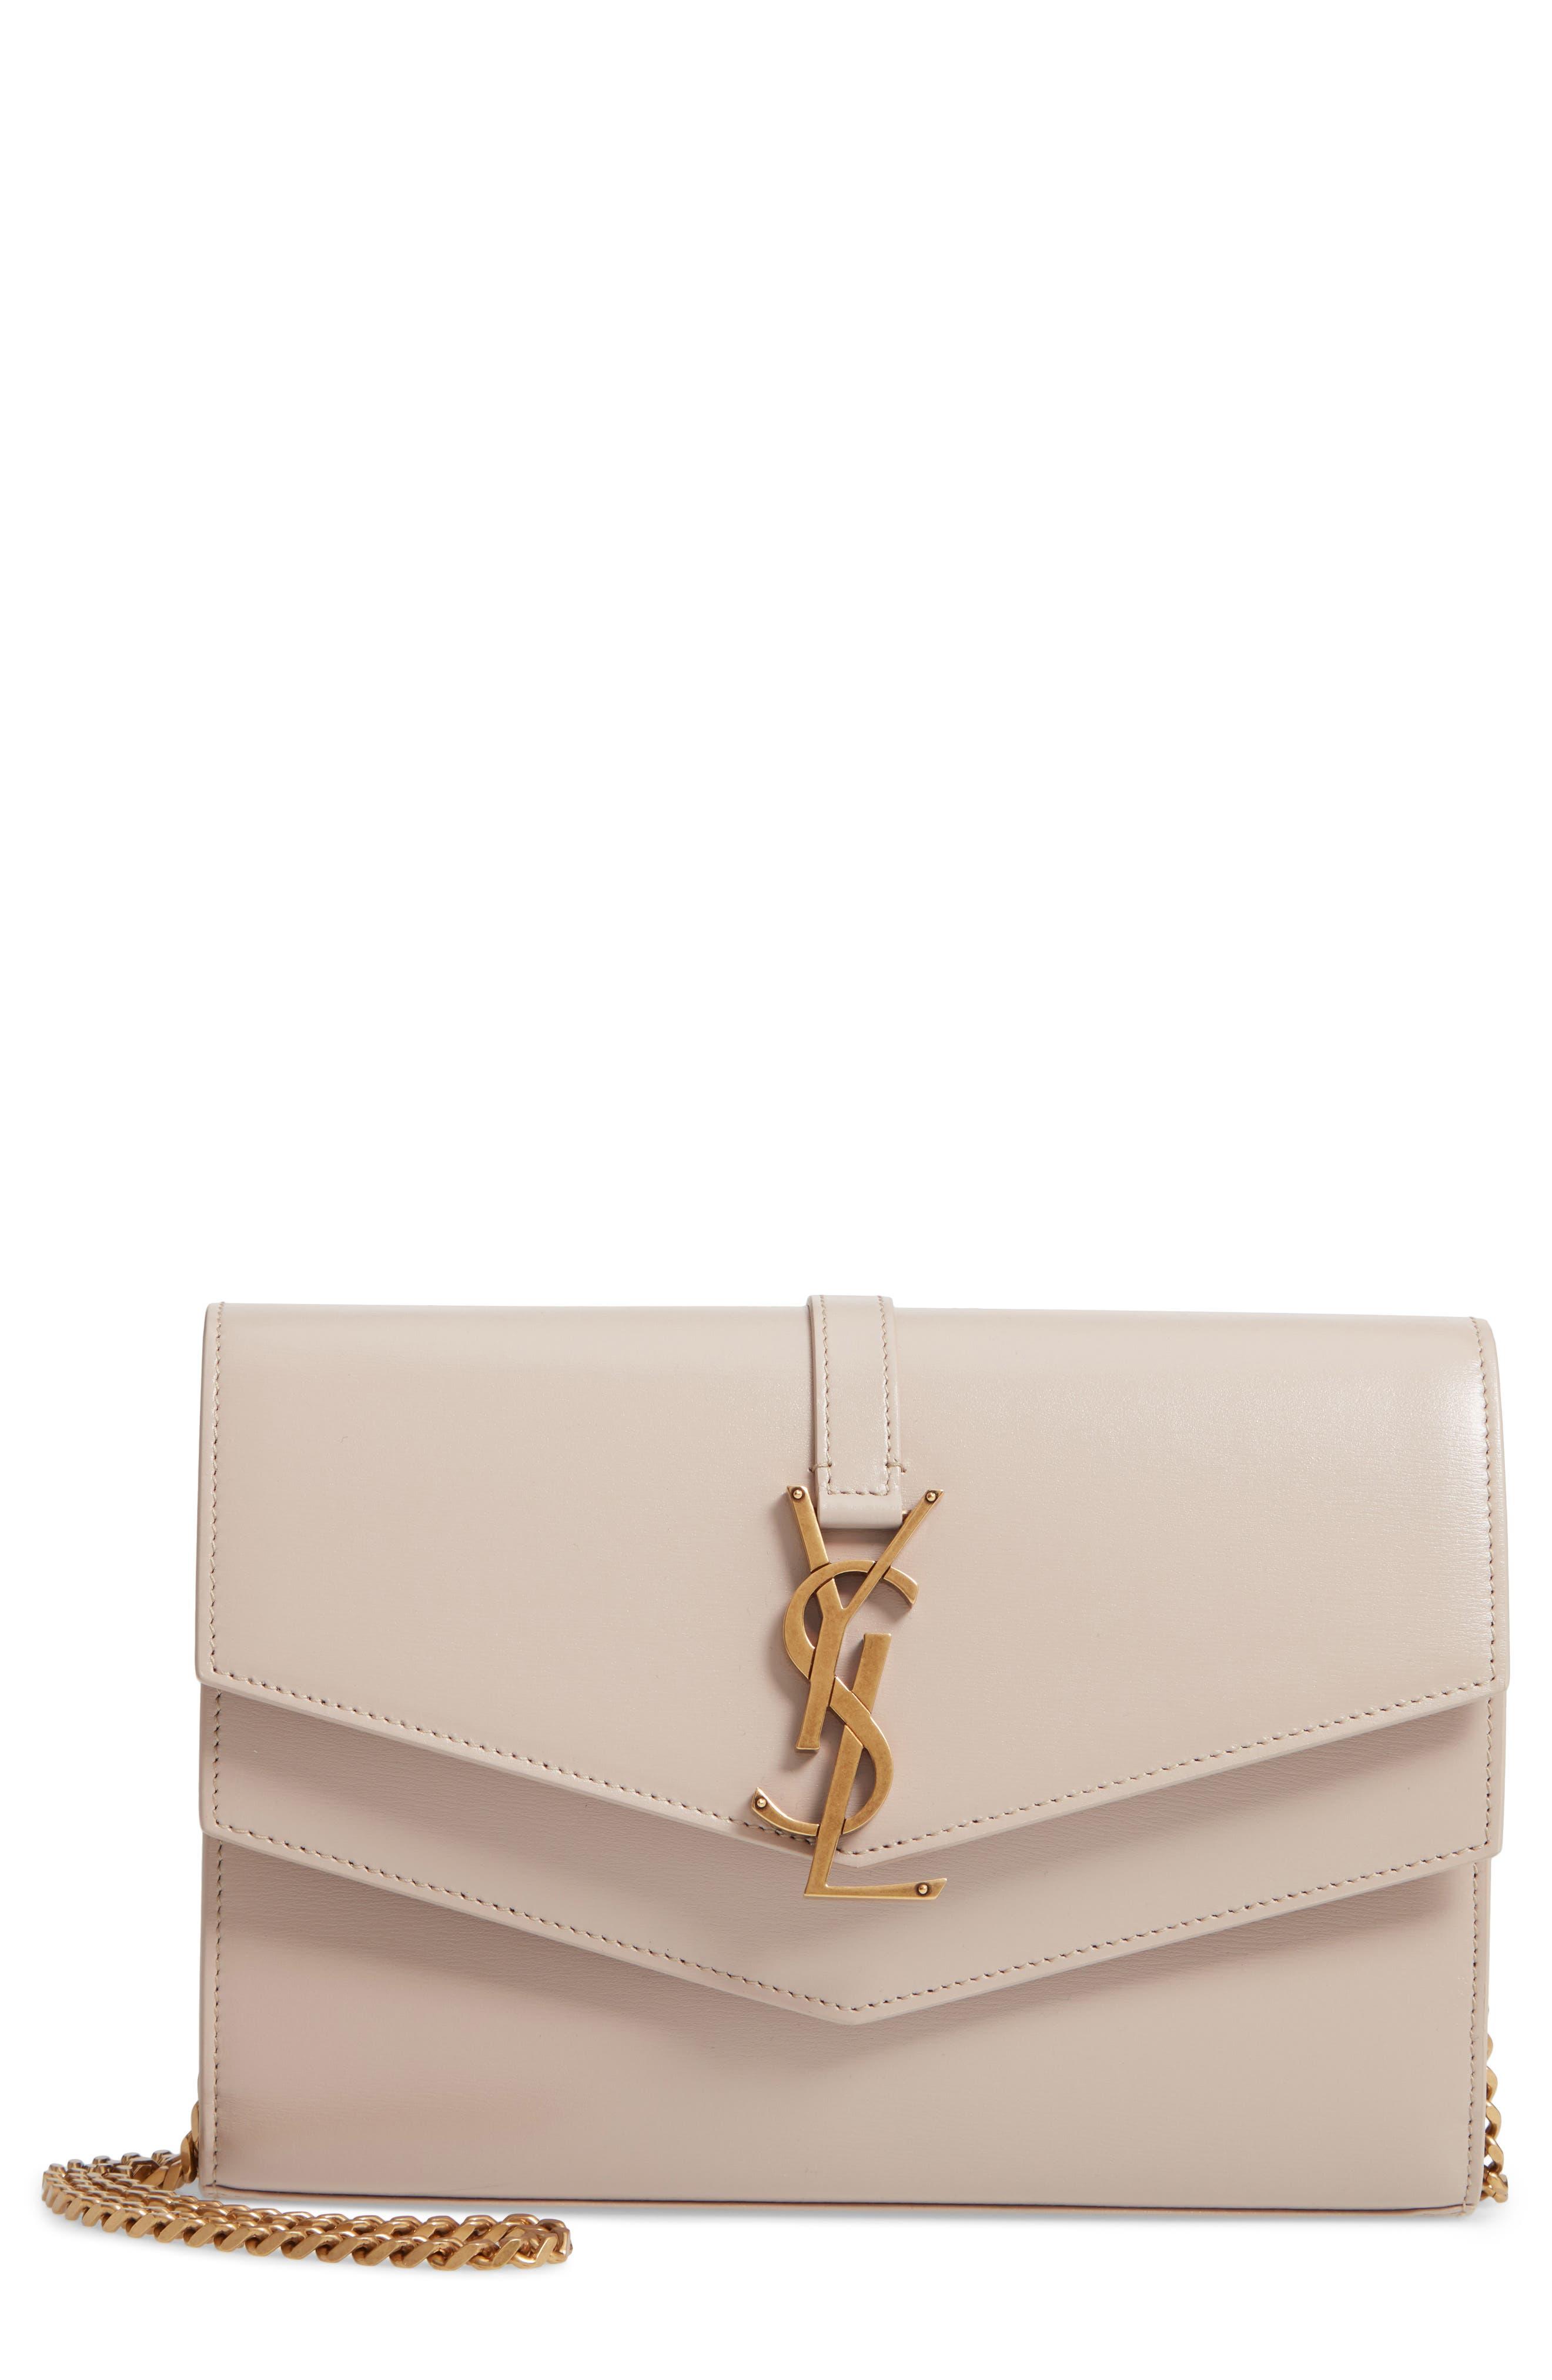 SAINT LAURENT Sulpice Leather Crossbody Wallet, Main, color, LIGHT NATURAL